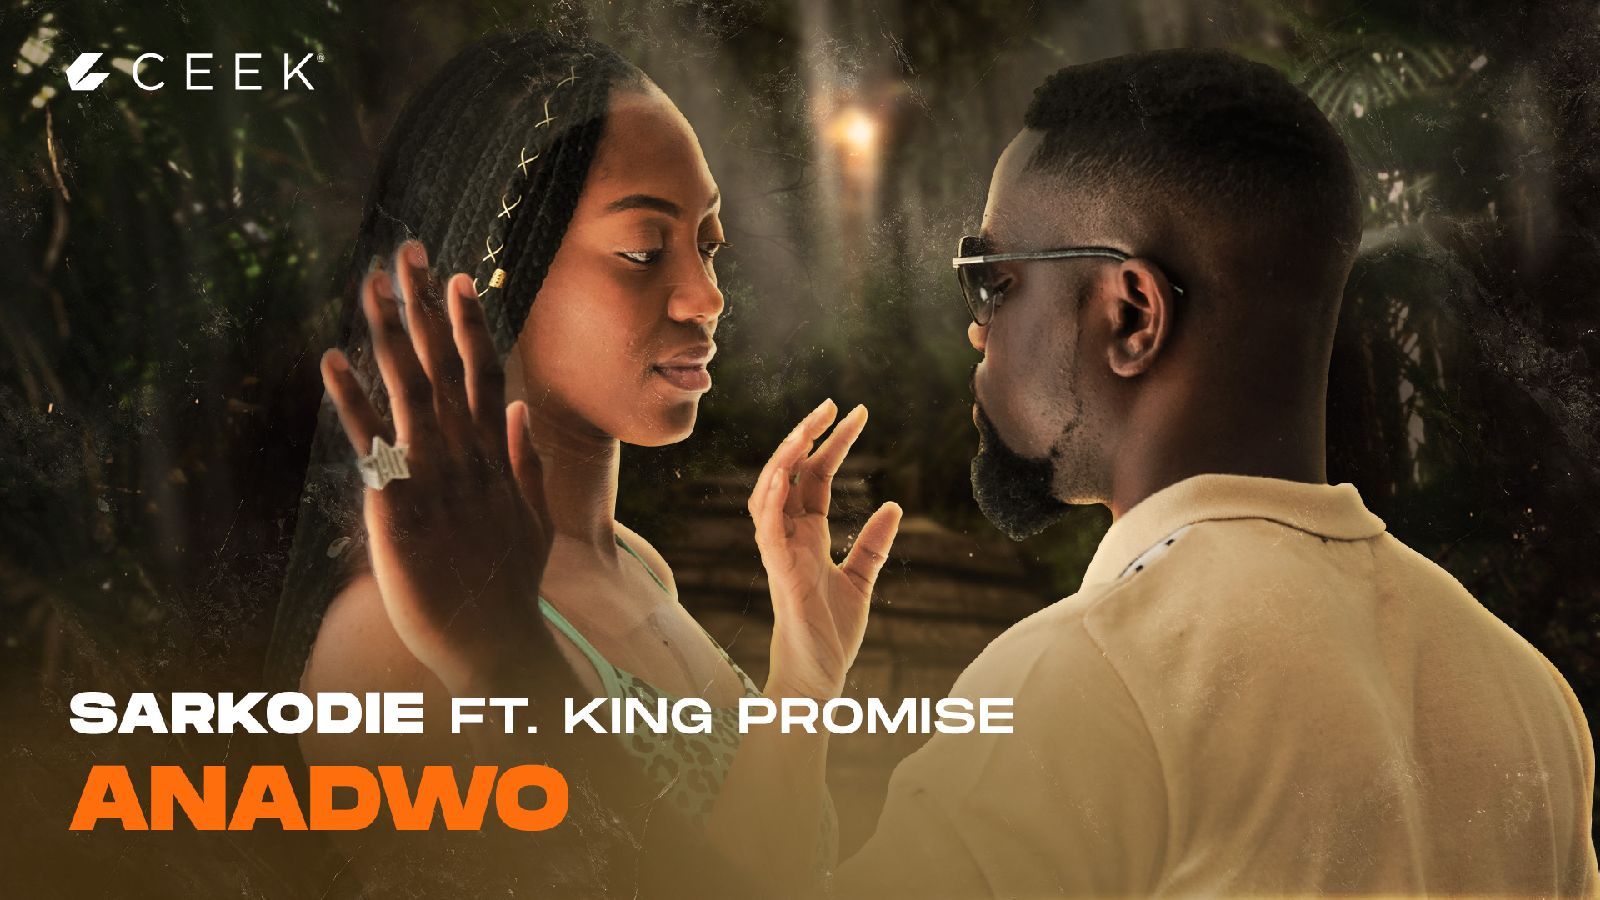 Sarkodie ft King Promise – Anadwo